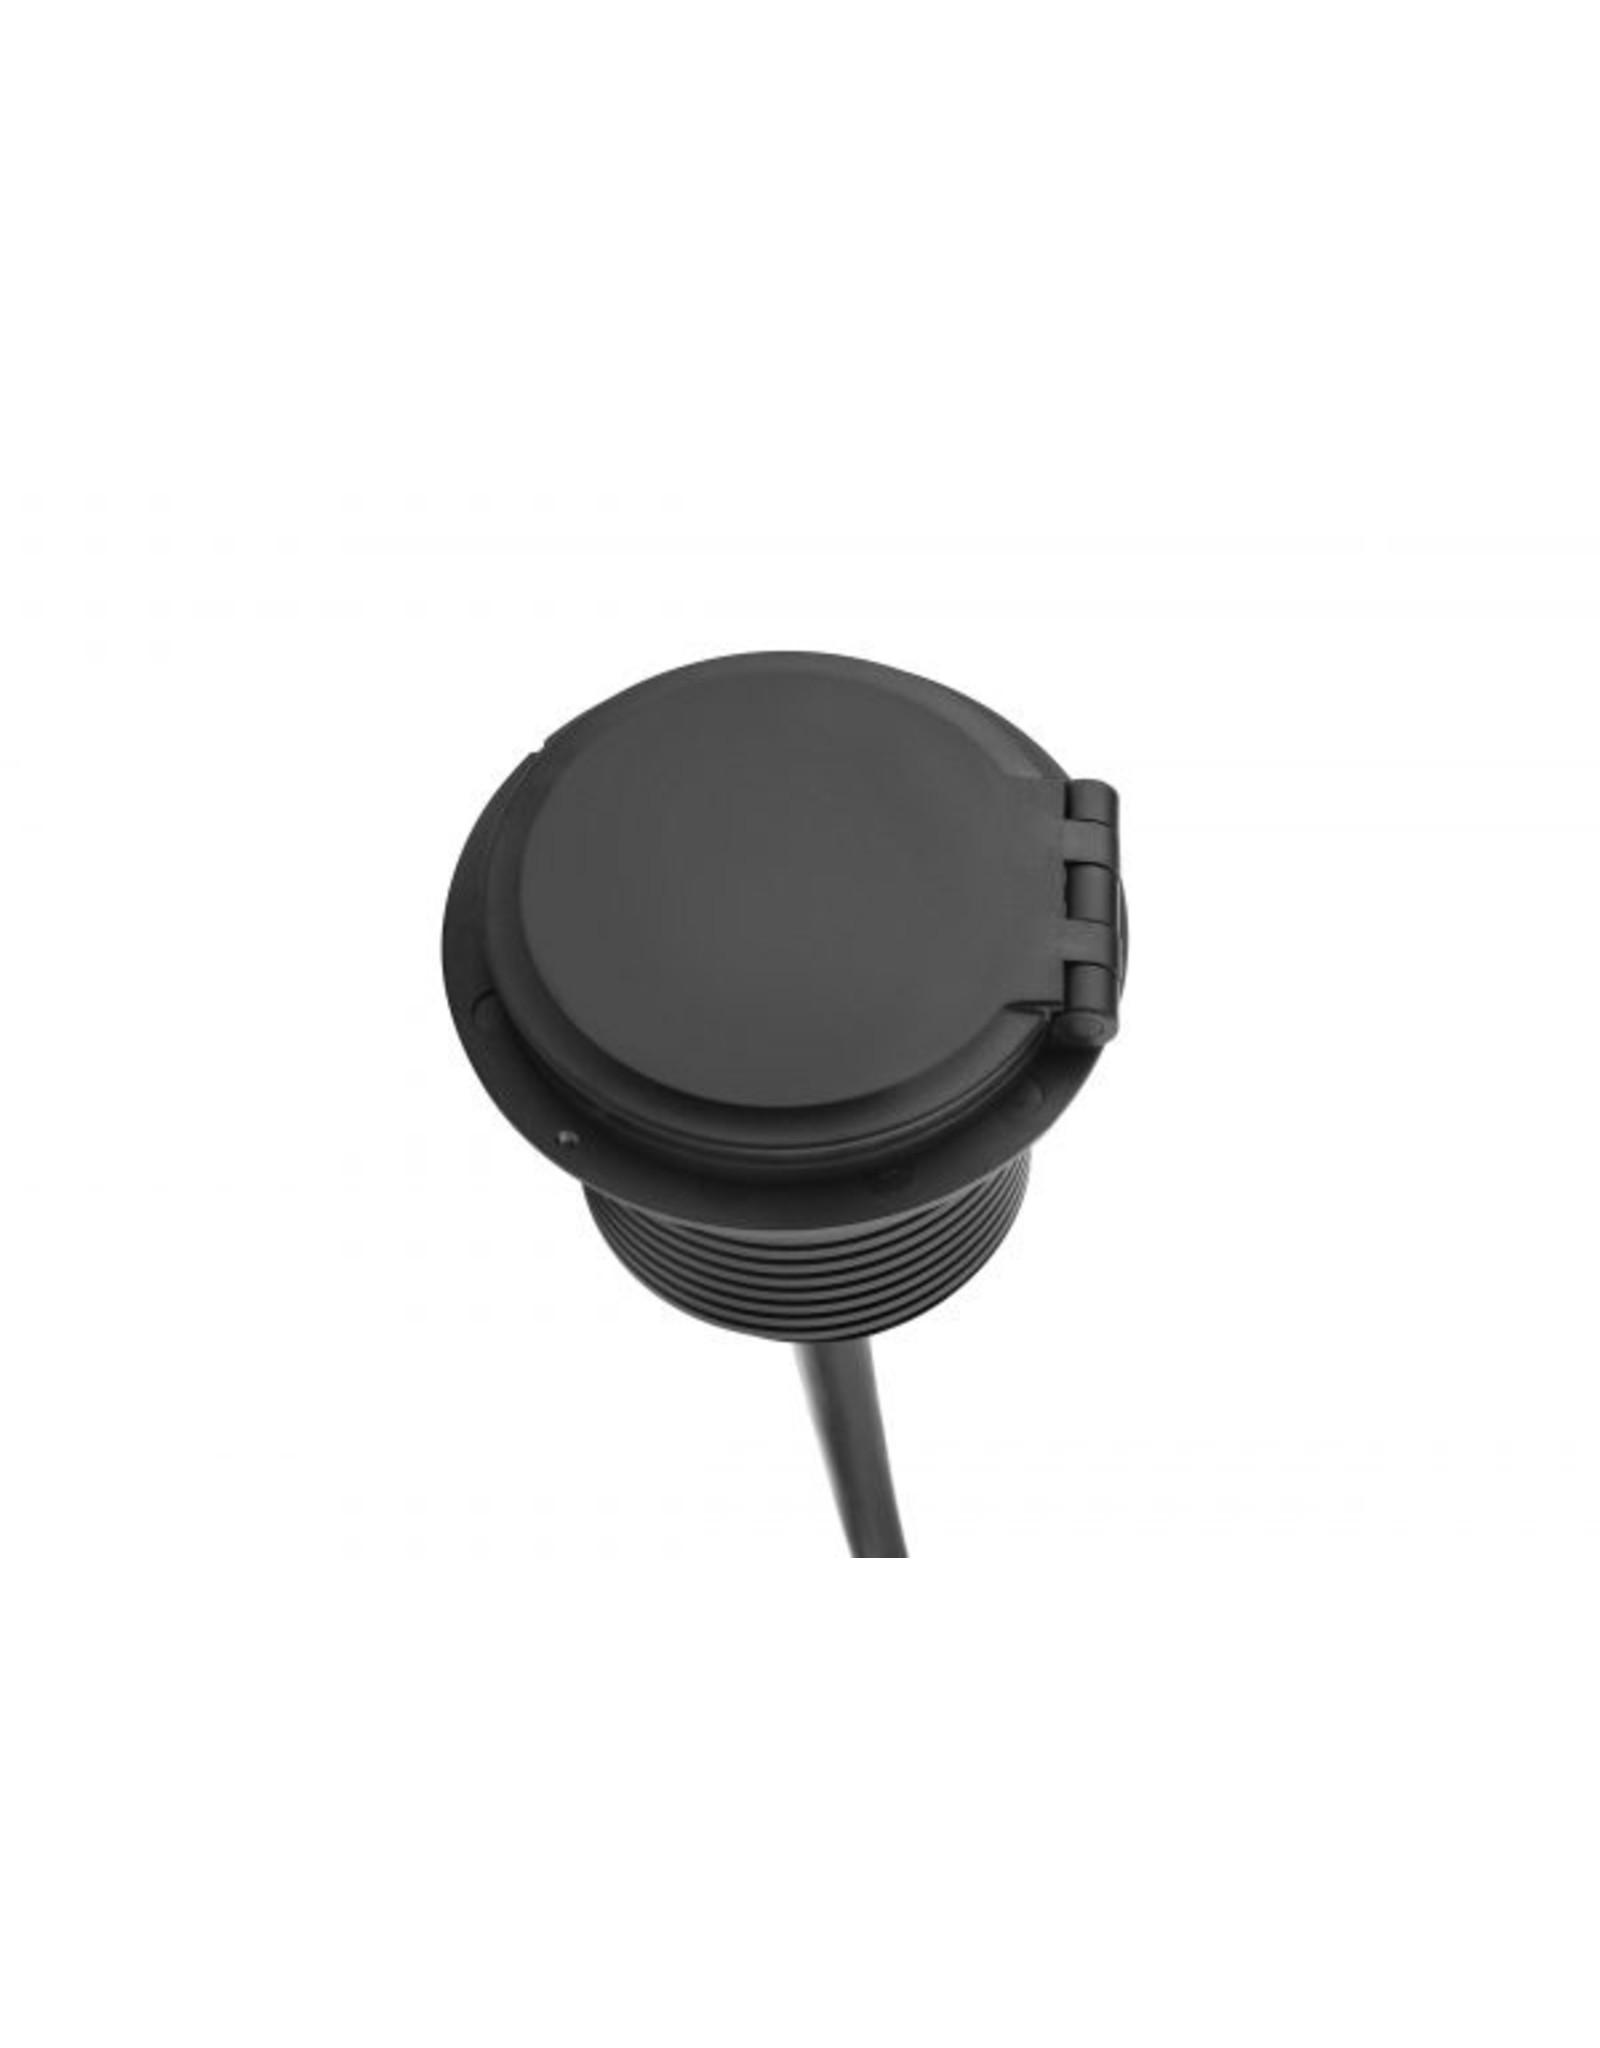 Ergo QI Power-Spot - 1x 230v, 1x USB A+C Charge, 1x Doorvoer